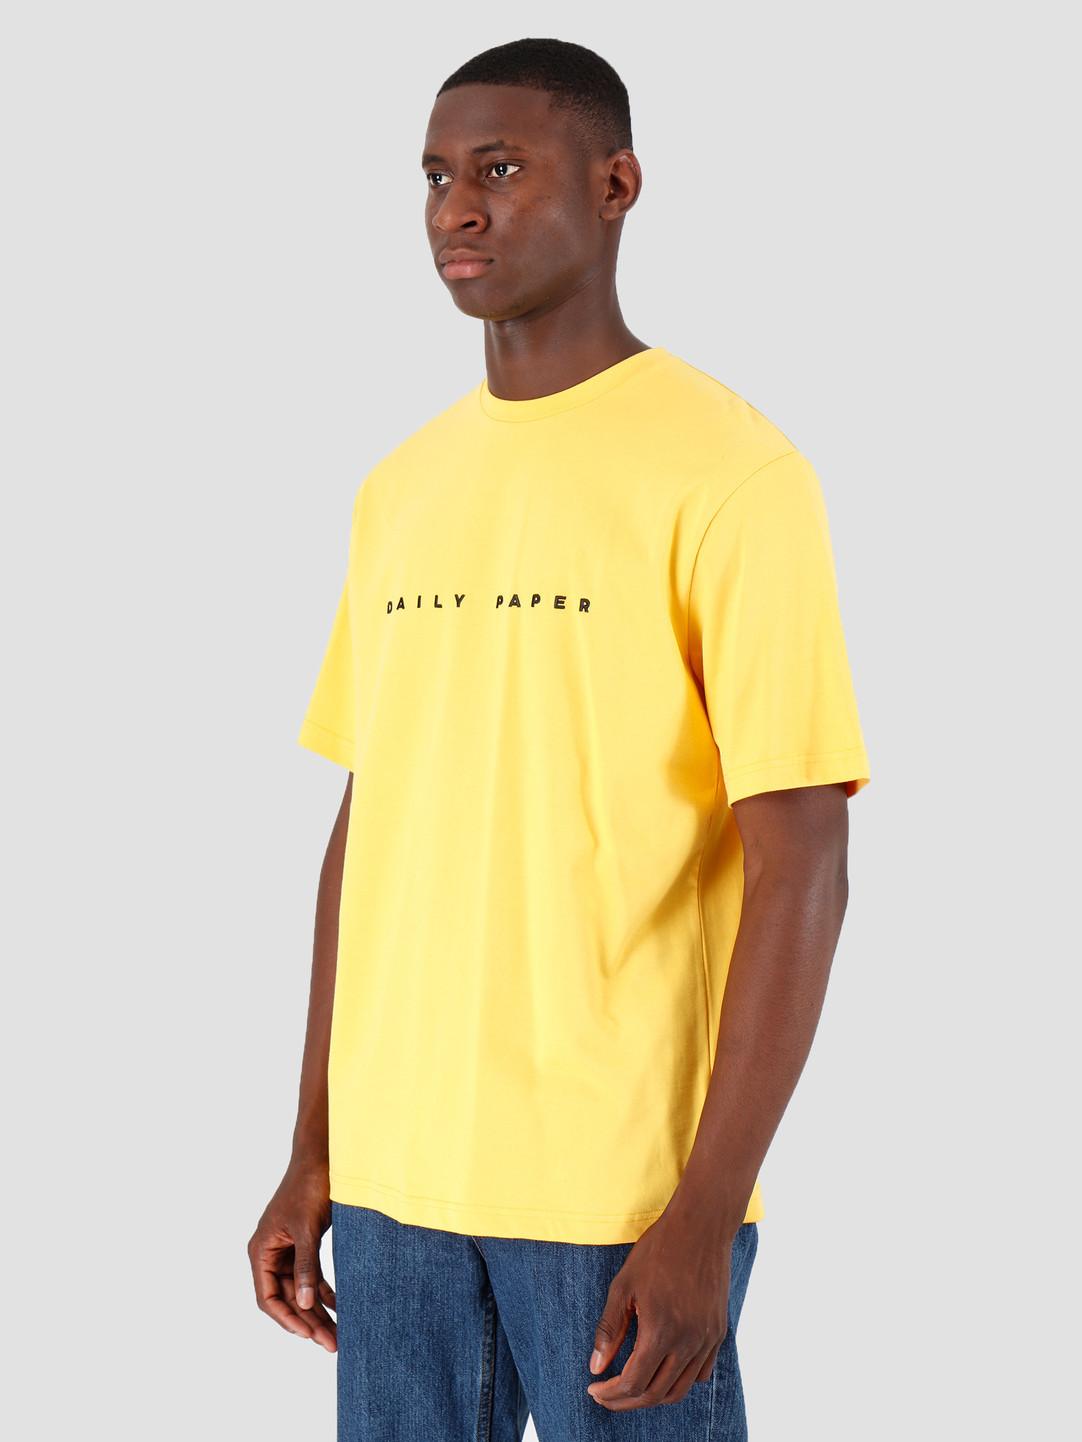 Daily Paper Daily Paper Alias T-shirt Yellow 19E1TS02-03